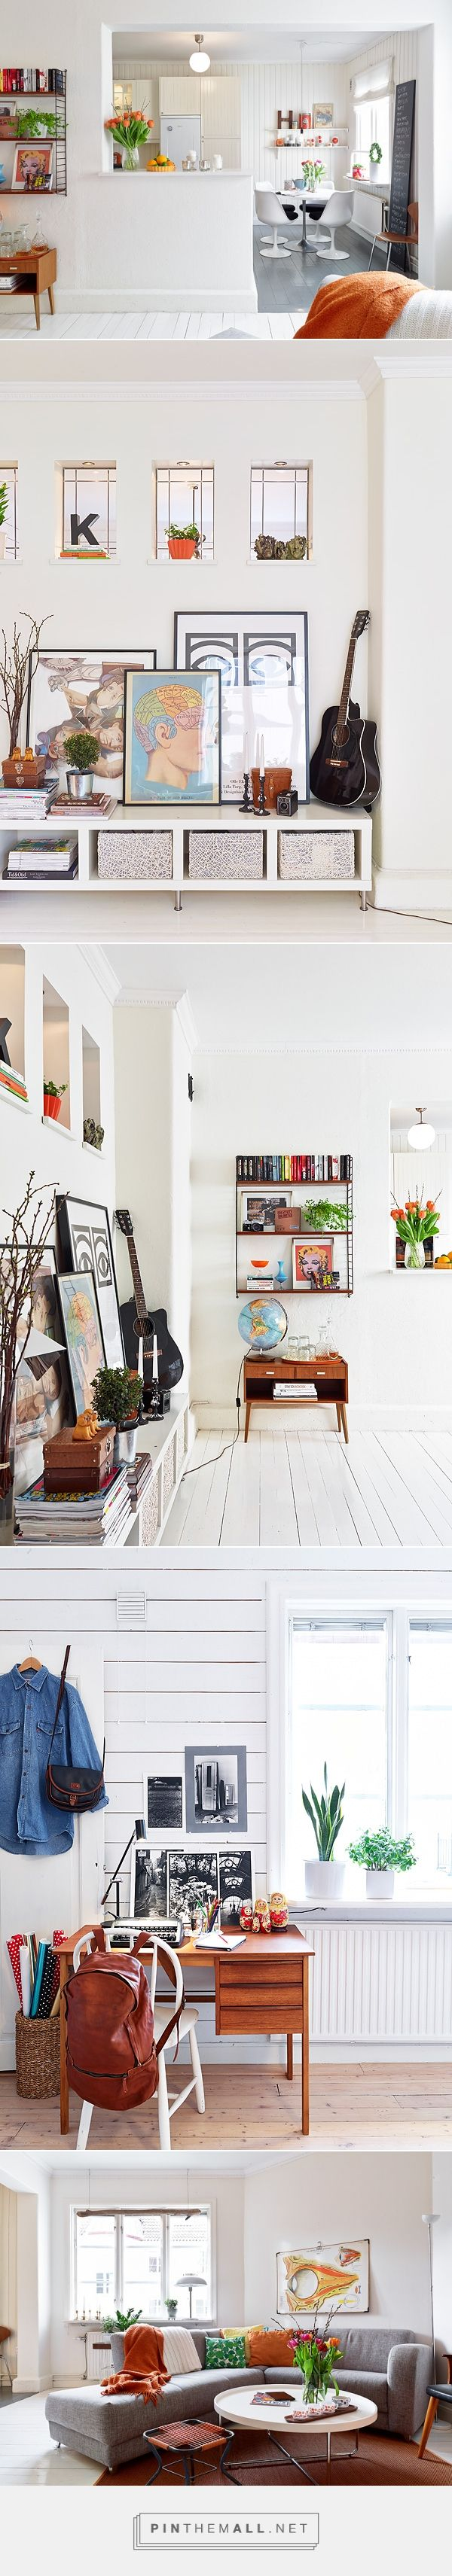 Light and airy Swedish home – Jelanie - created via https://pinthemall.net